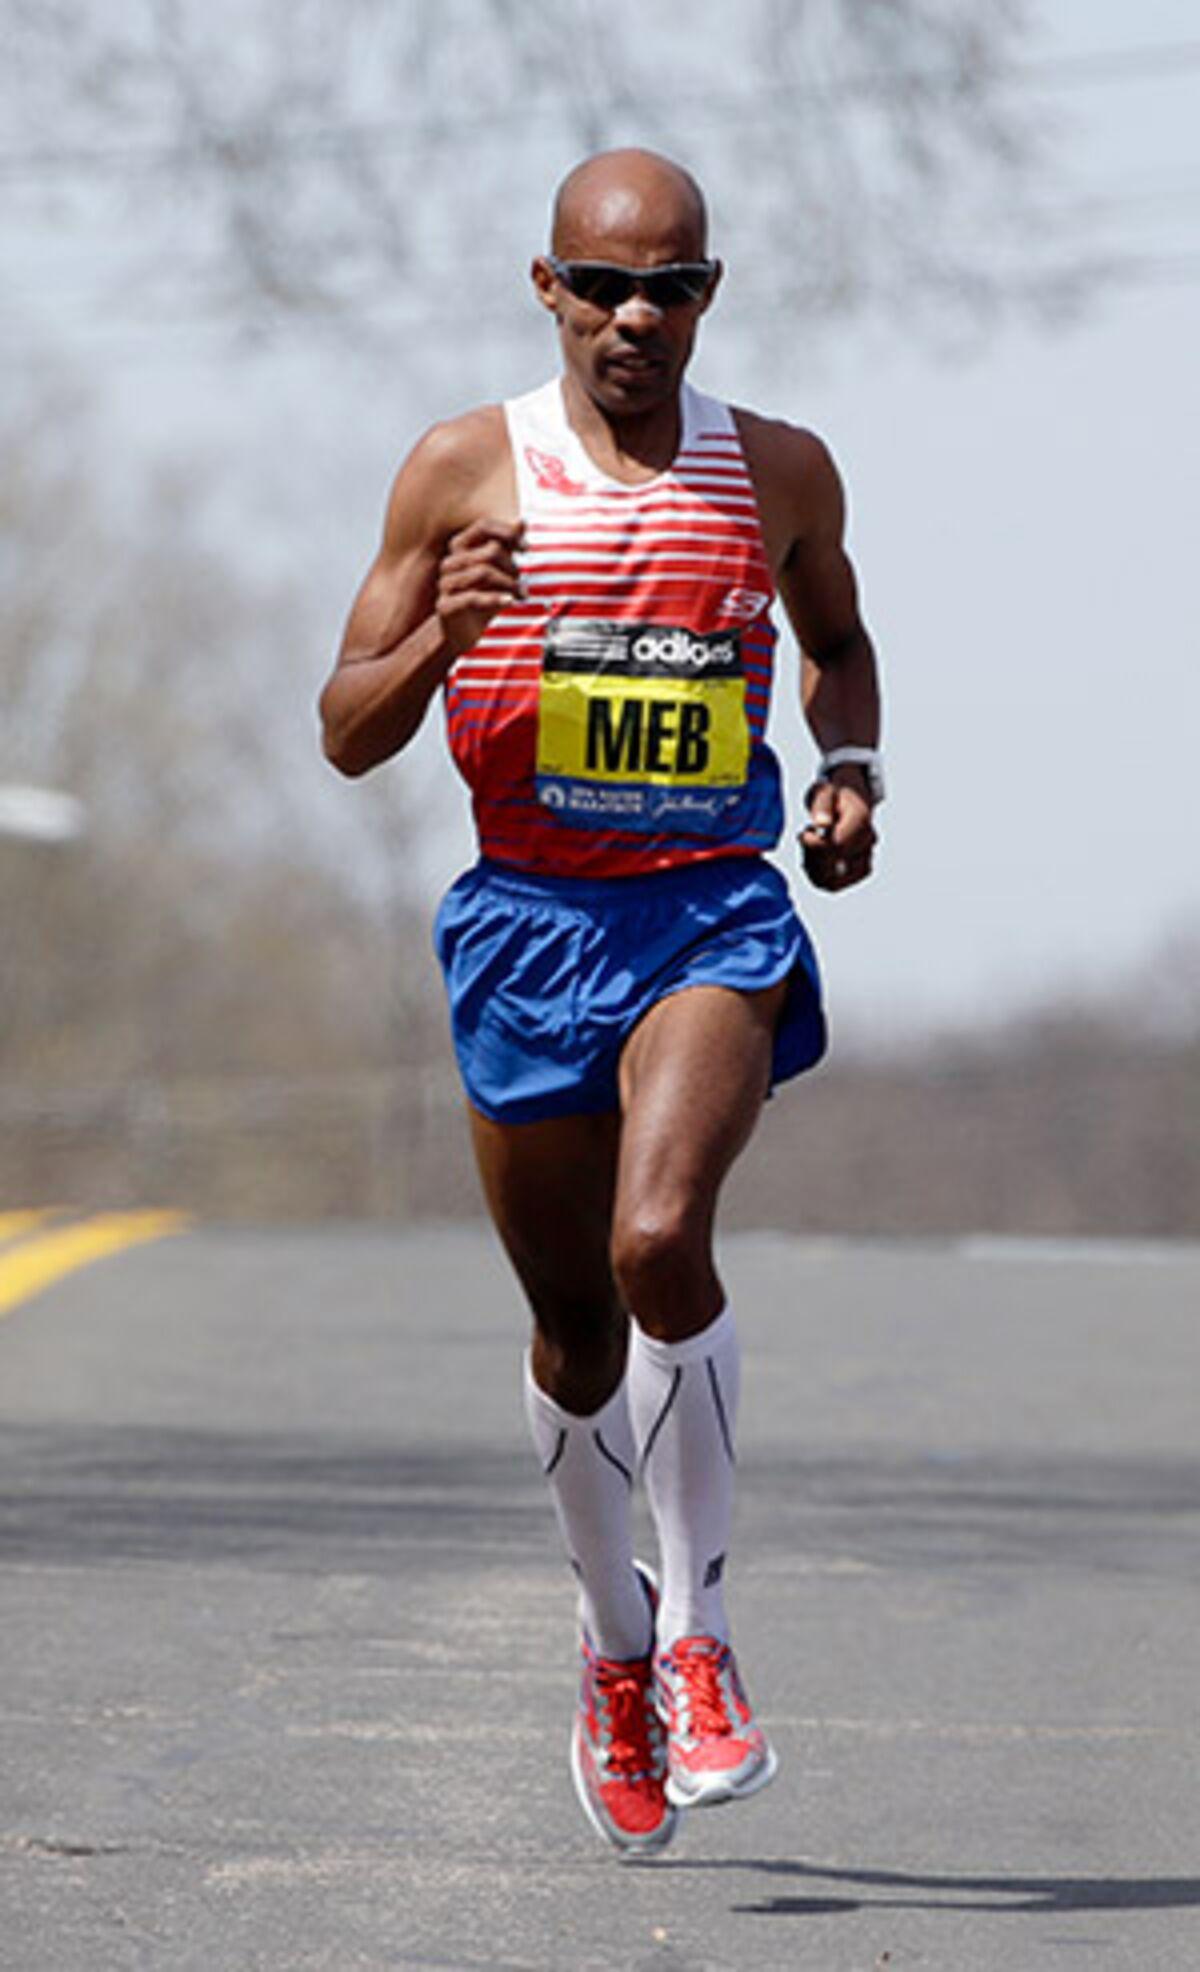 Skechers Won the Boston Marathon. But